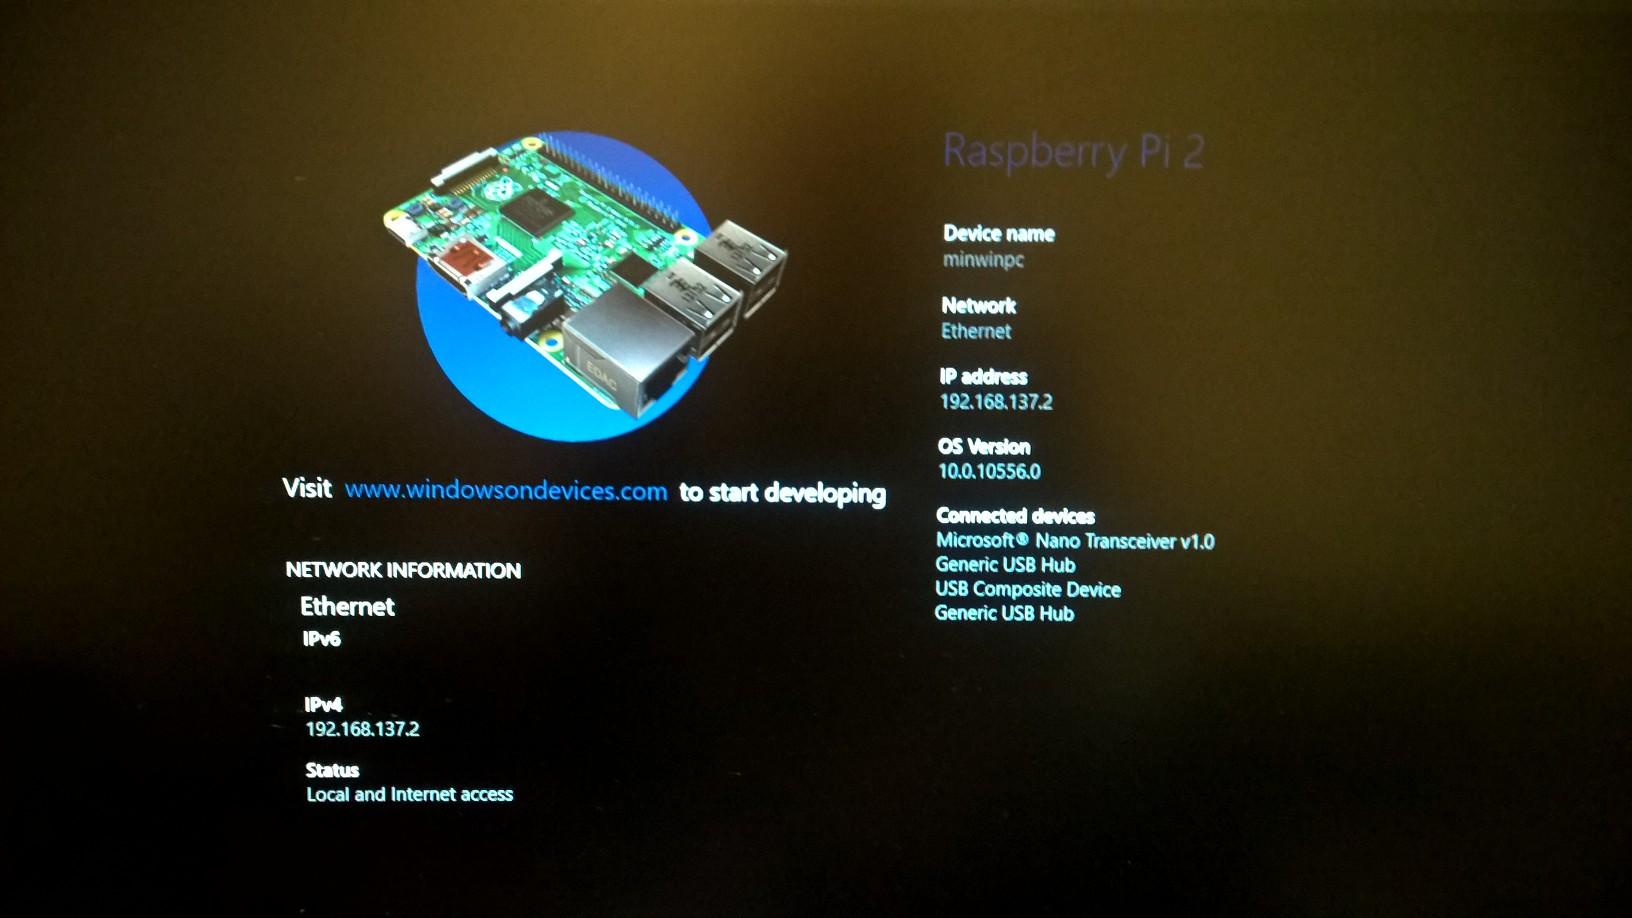 Windows 10 enable ics - Rpi2 Win10 Dashboard